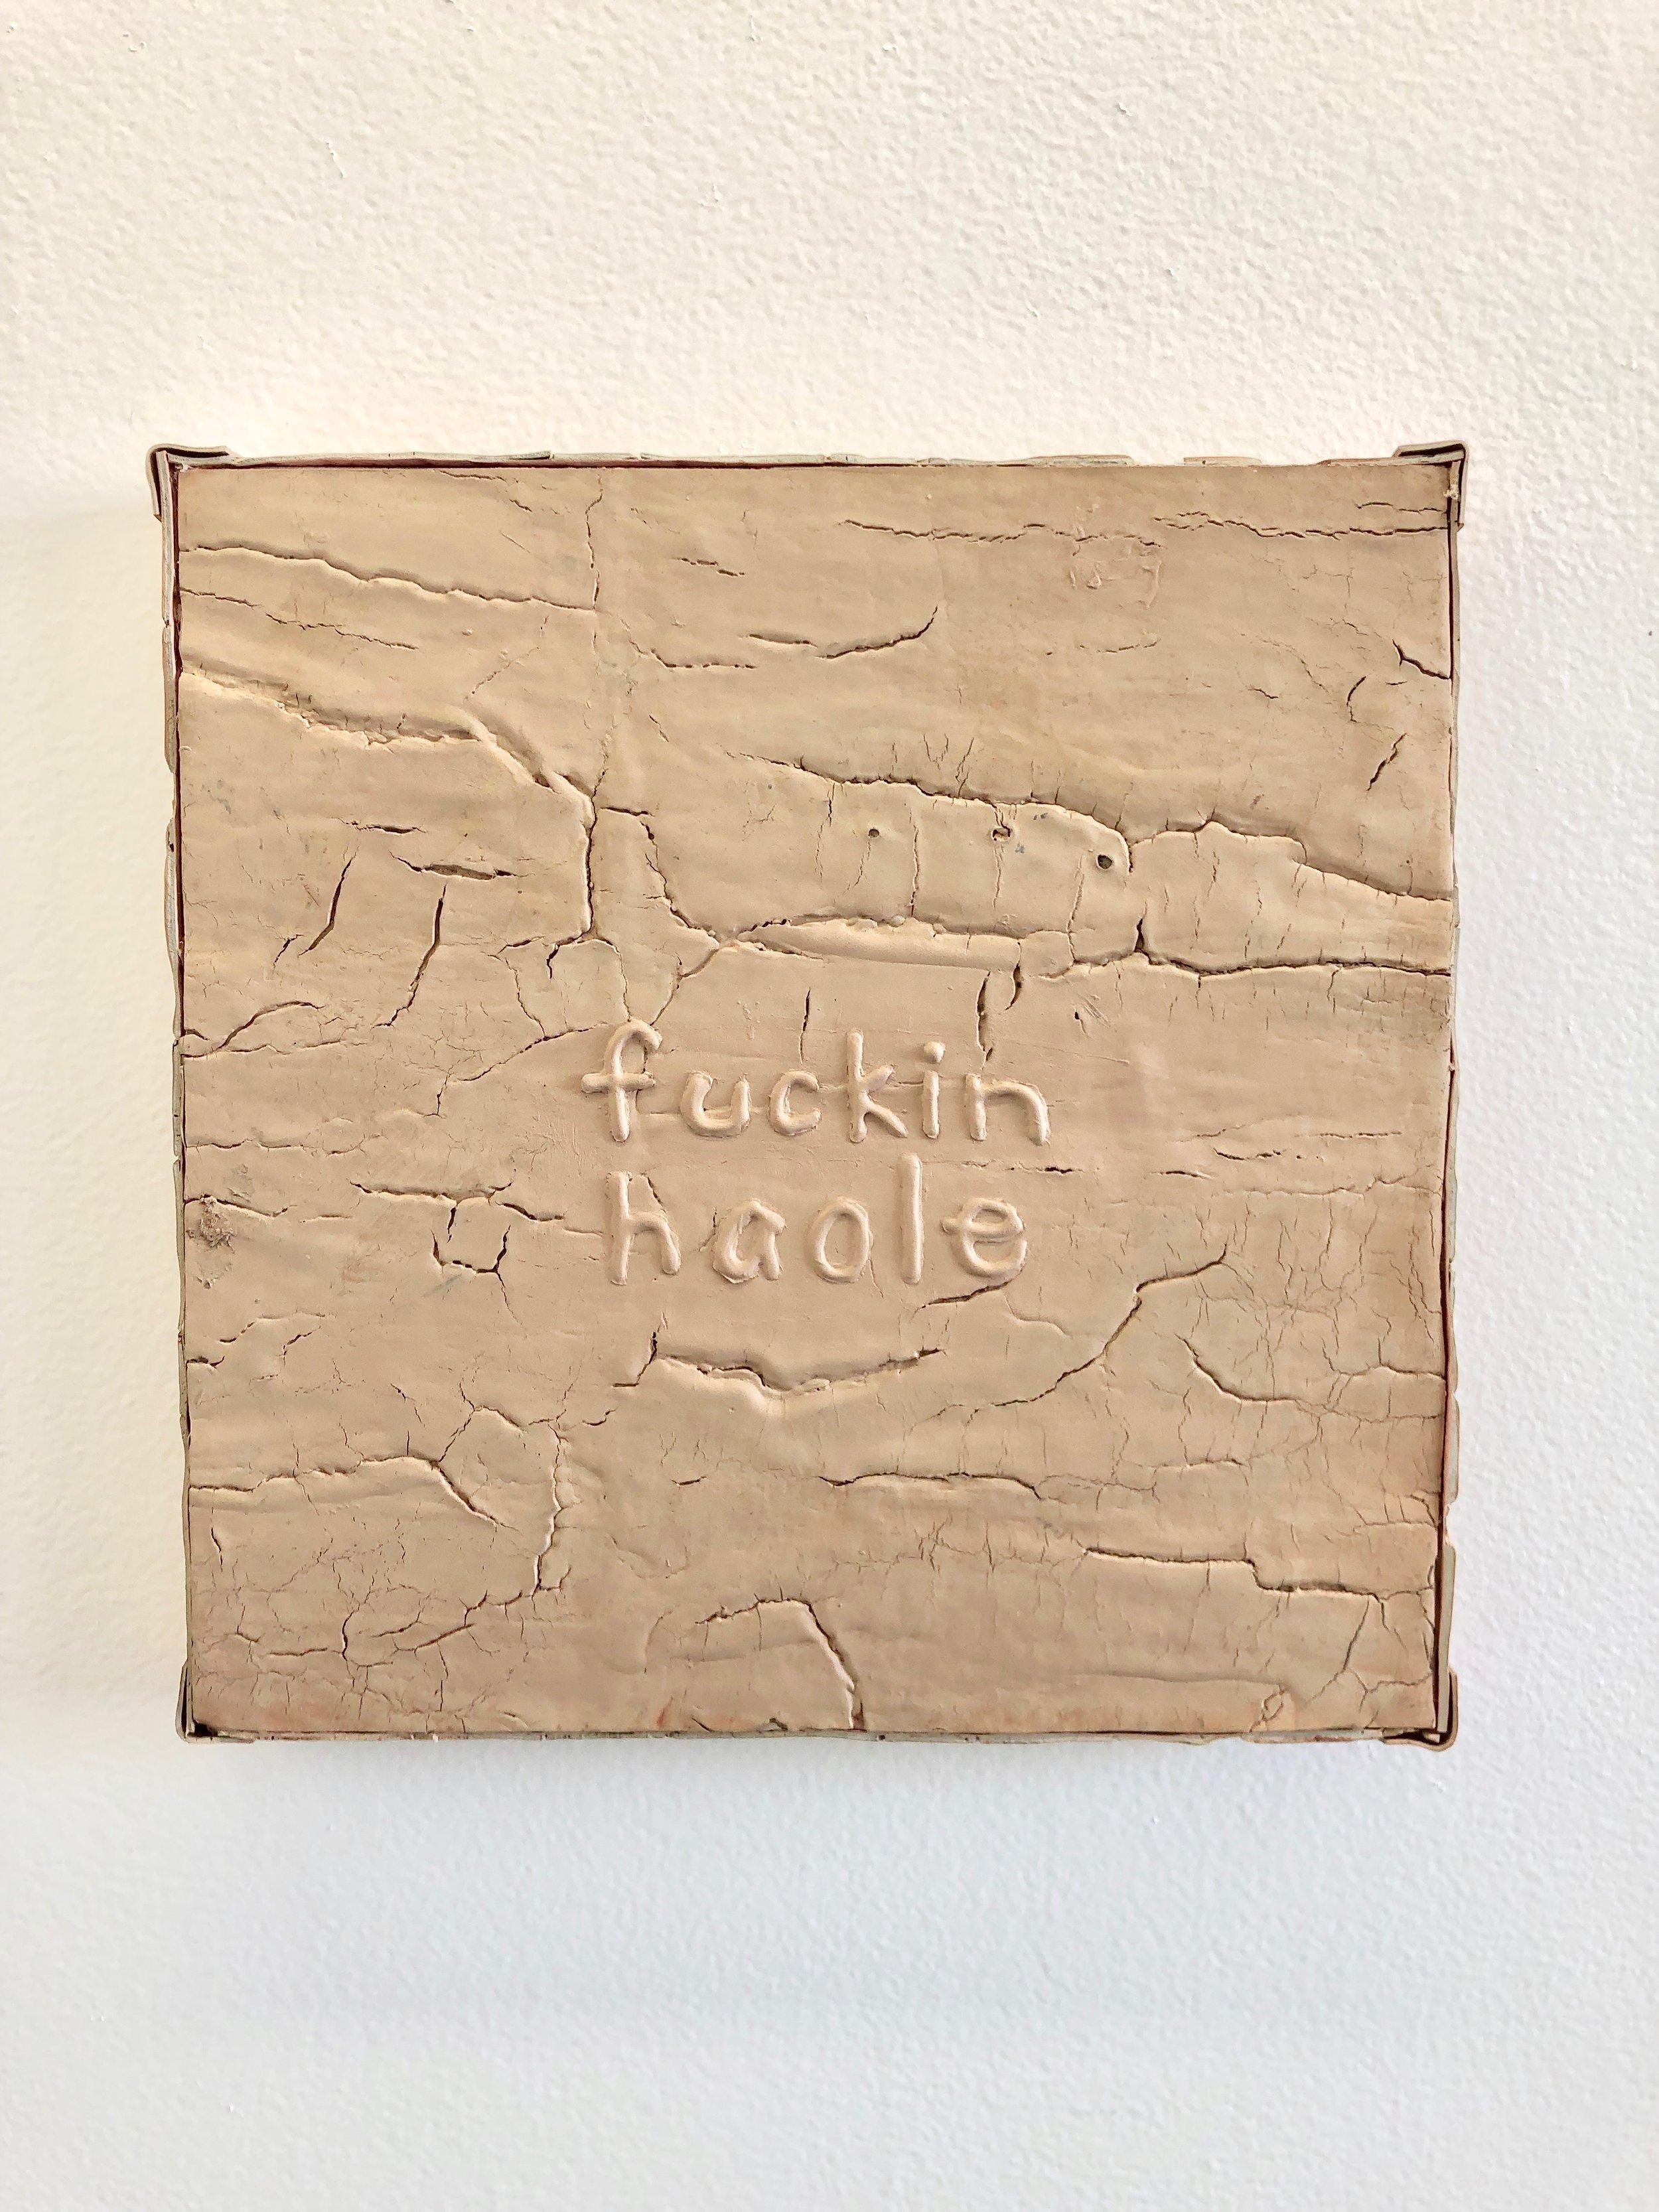 Untitled (fuckin haole), 2018, Natalia DaSilva